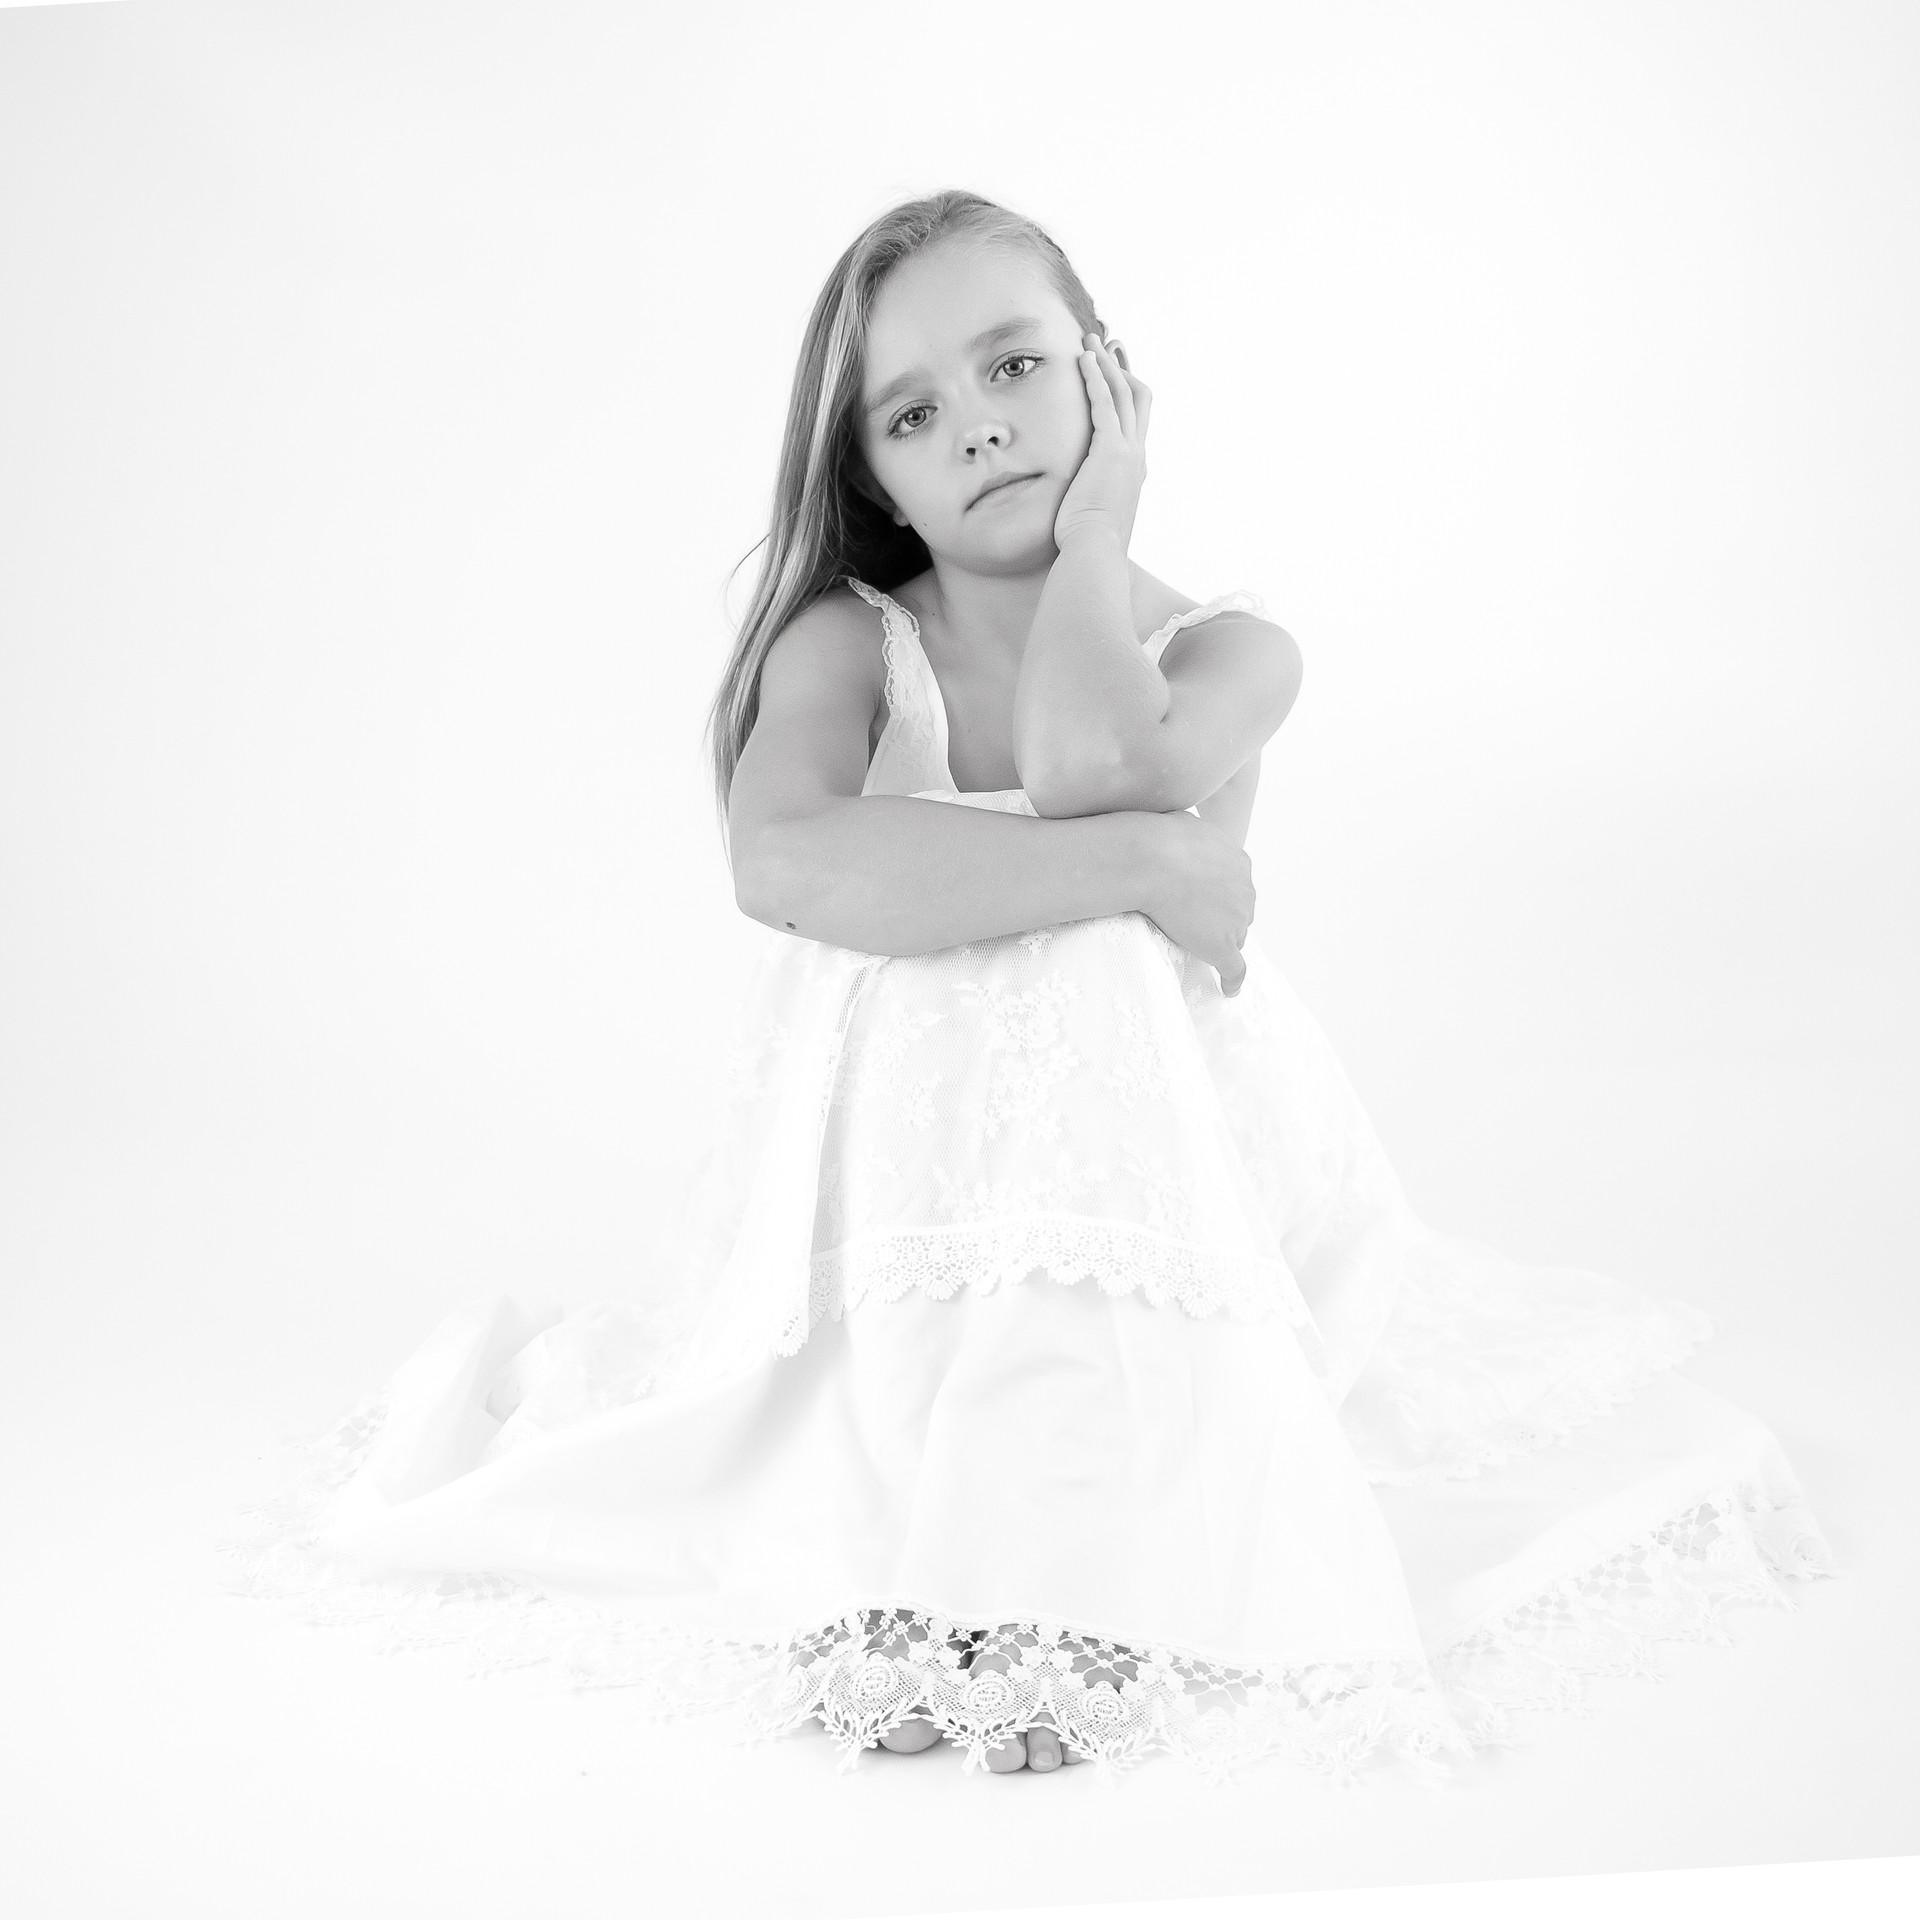 Malia. Creative Children and baby Photography Studio shoot, Dream Alice Photography & Art, Gold Coast